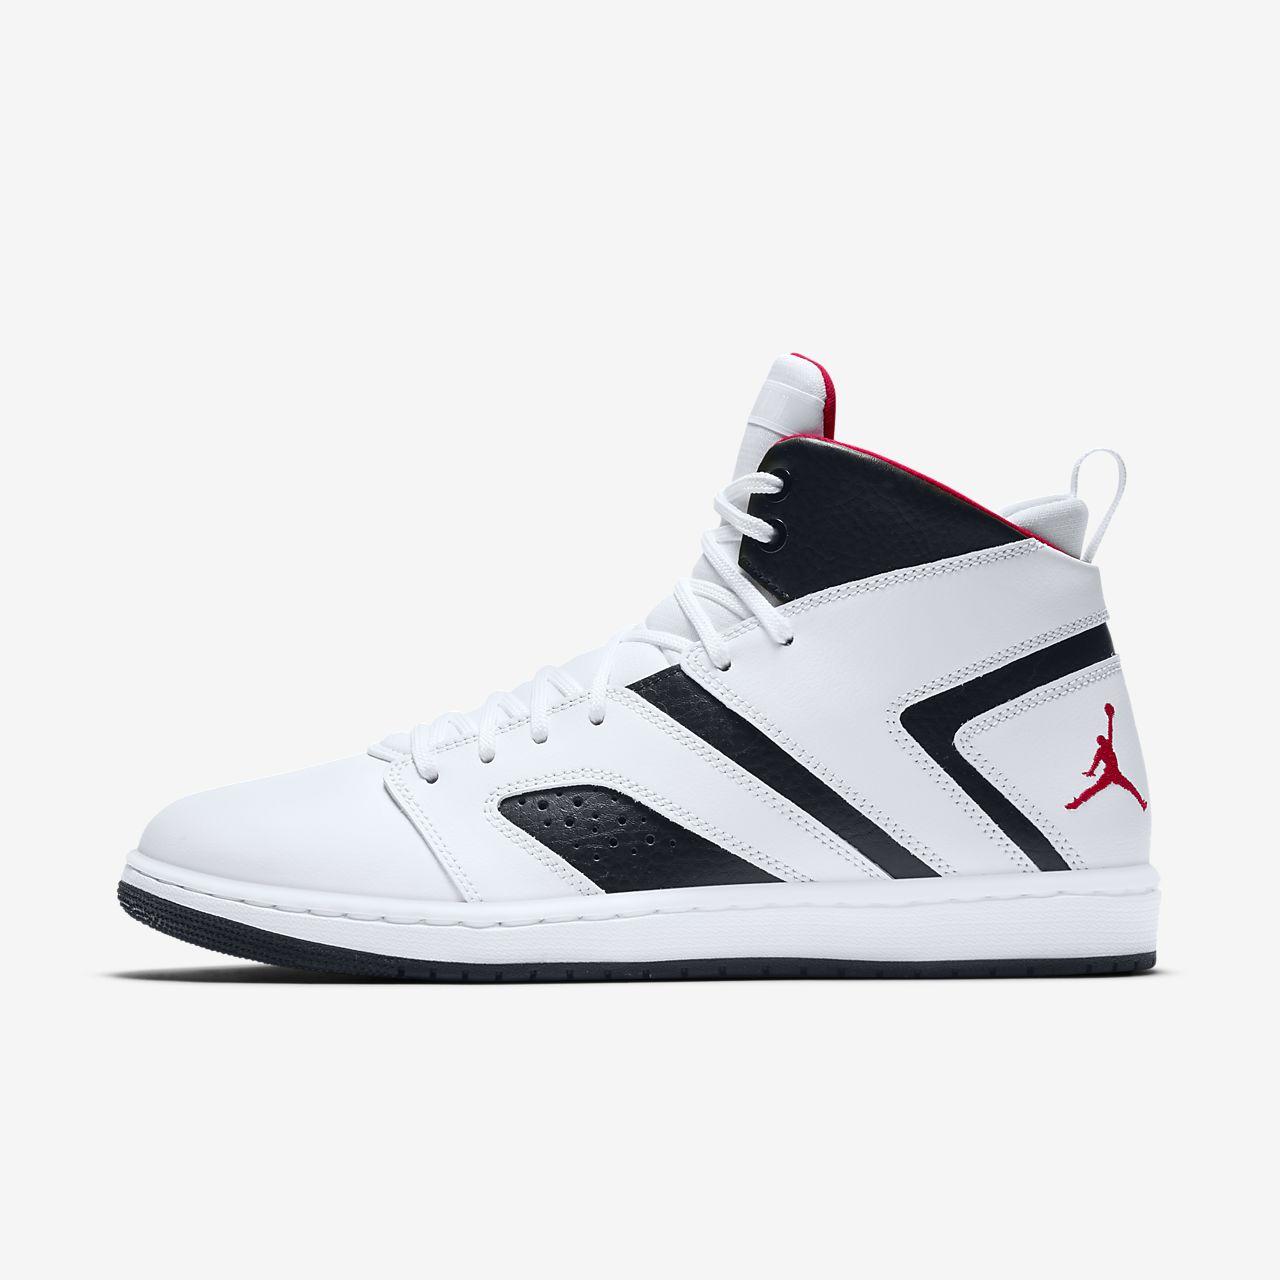 ... Jordan Flight Legend Men's Shoe